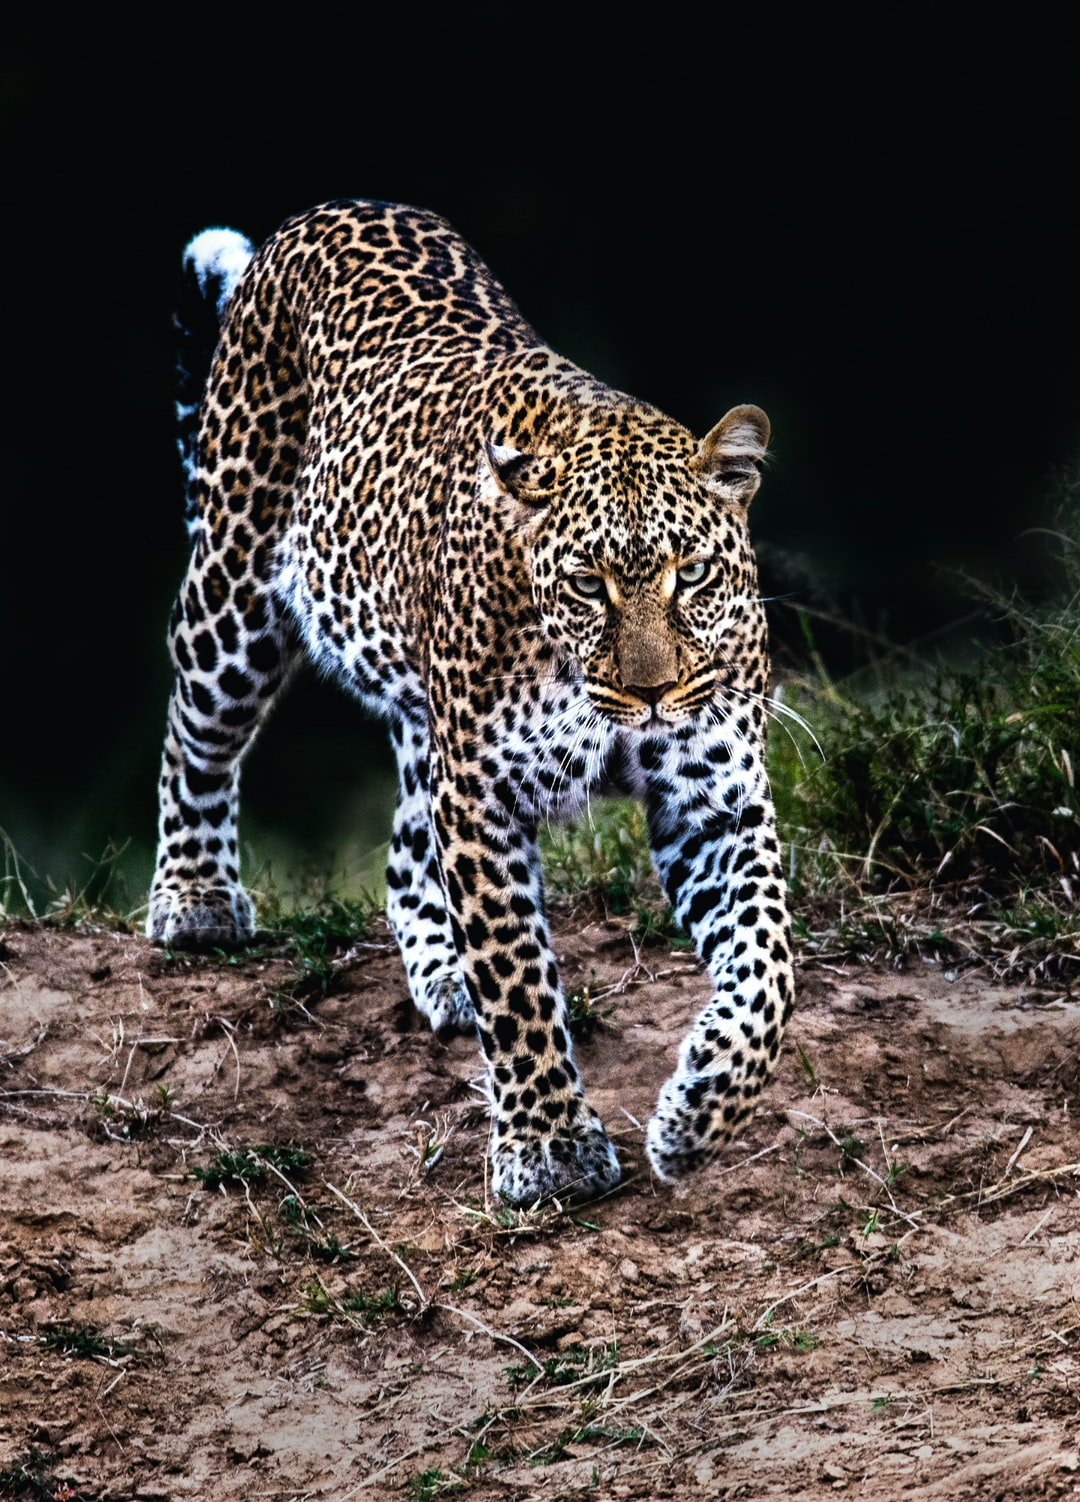 leopard encounter. A gorgeous female leopard patrols her territory in the Masai Mara, Kenya.